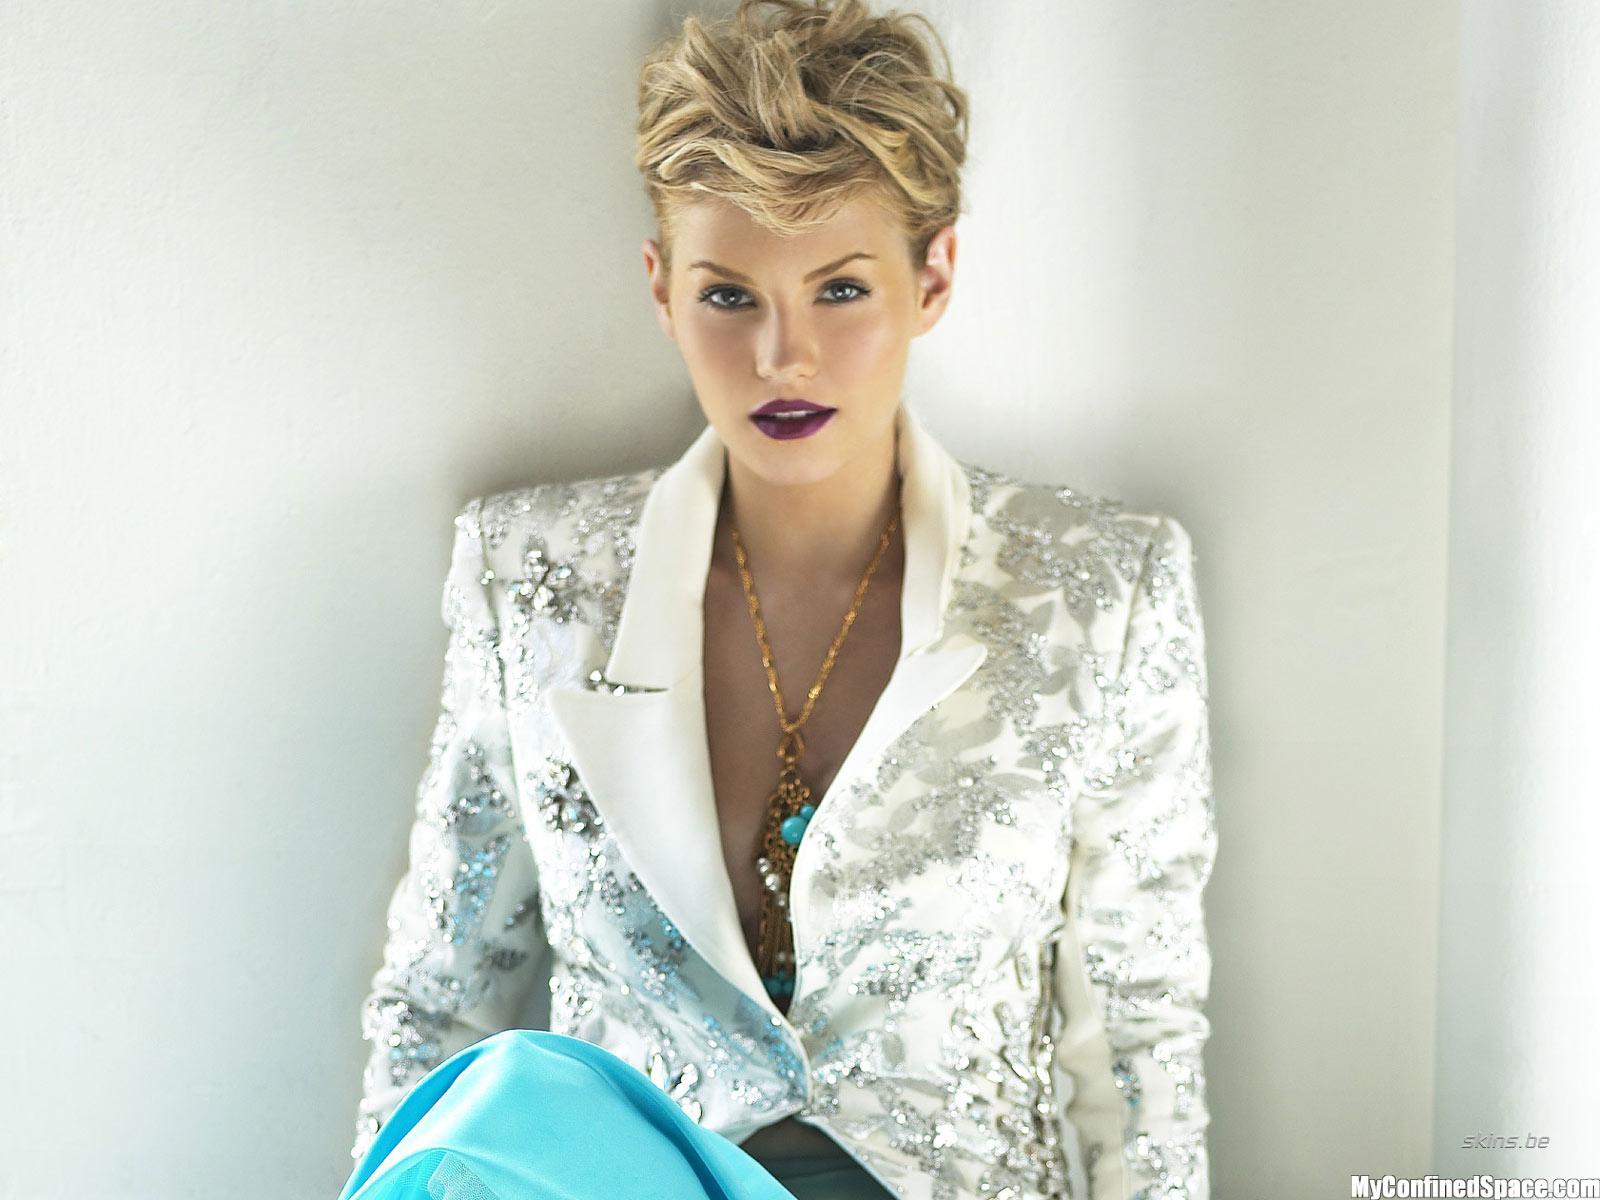 http://3.bp.blogspot.com/-7kdhkPHPPP8/UB4kL625NtI/AAAAAAAAAQ8/3kbzzwM2rFo/s1600/elisha-cuthbert-short-hair.jpg